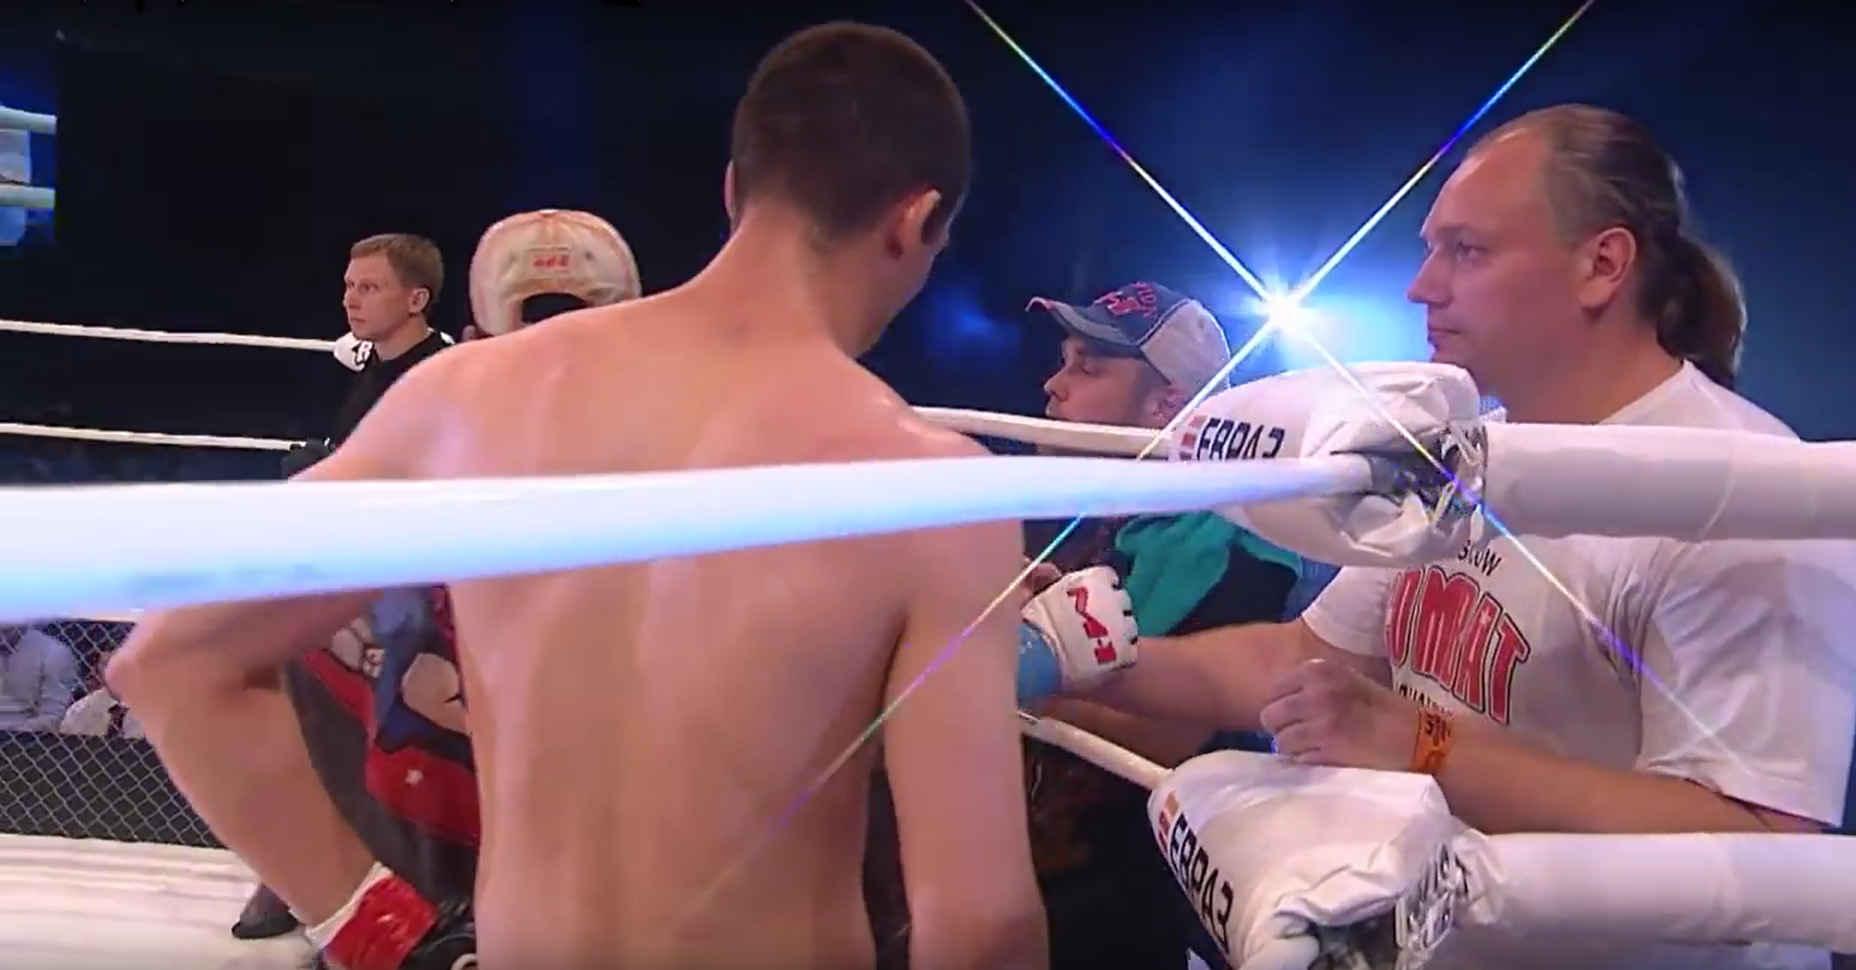 Makarov COMBAT MMA Shamanin M-1.jpg